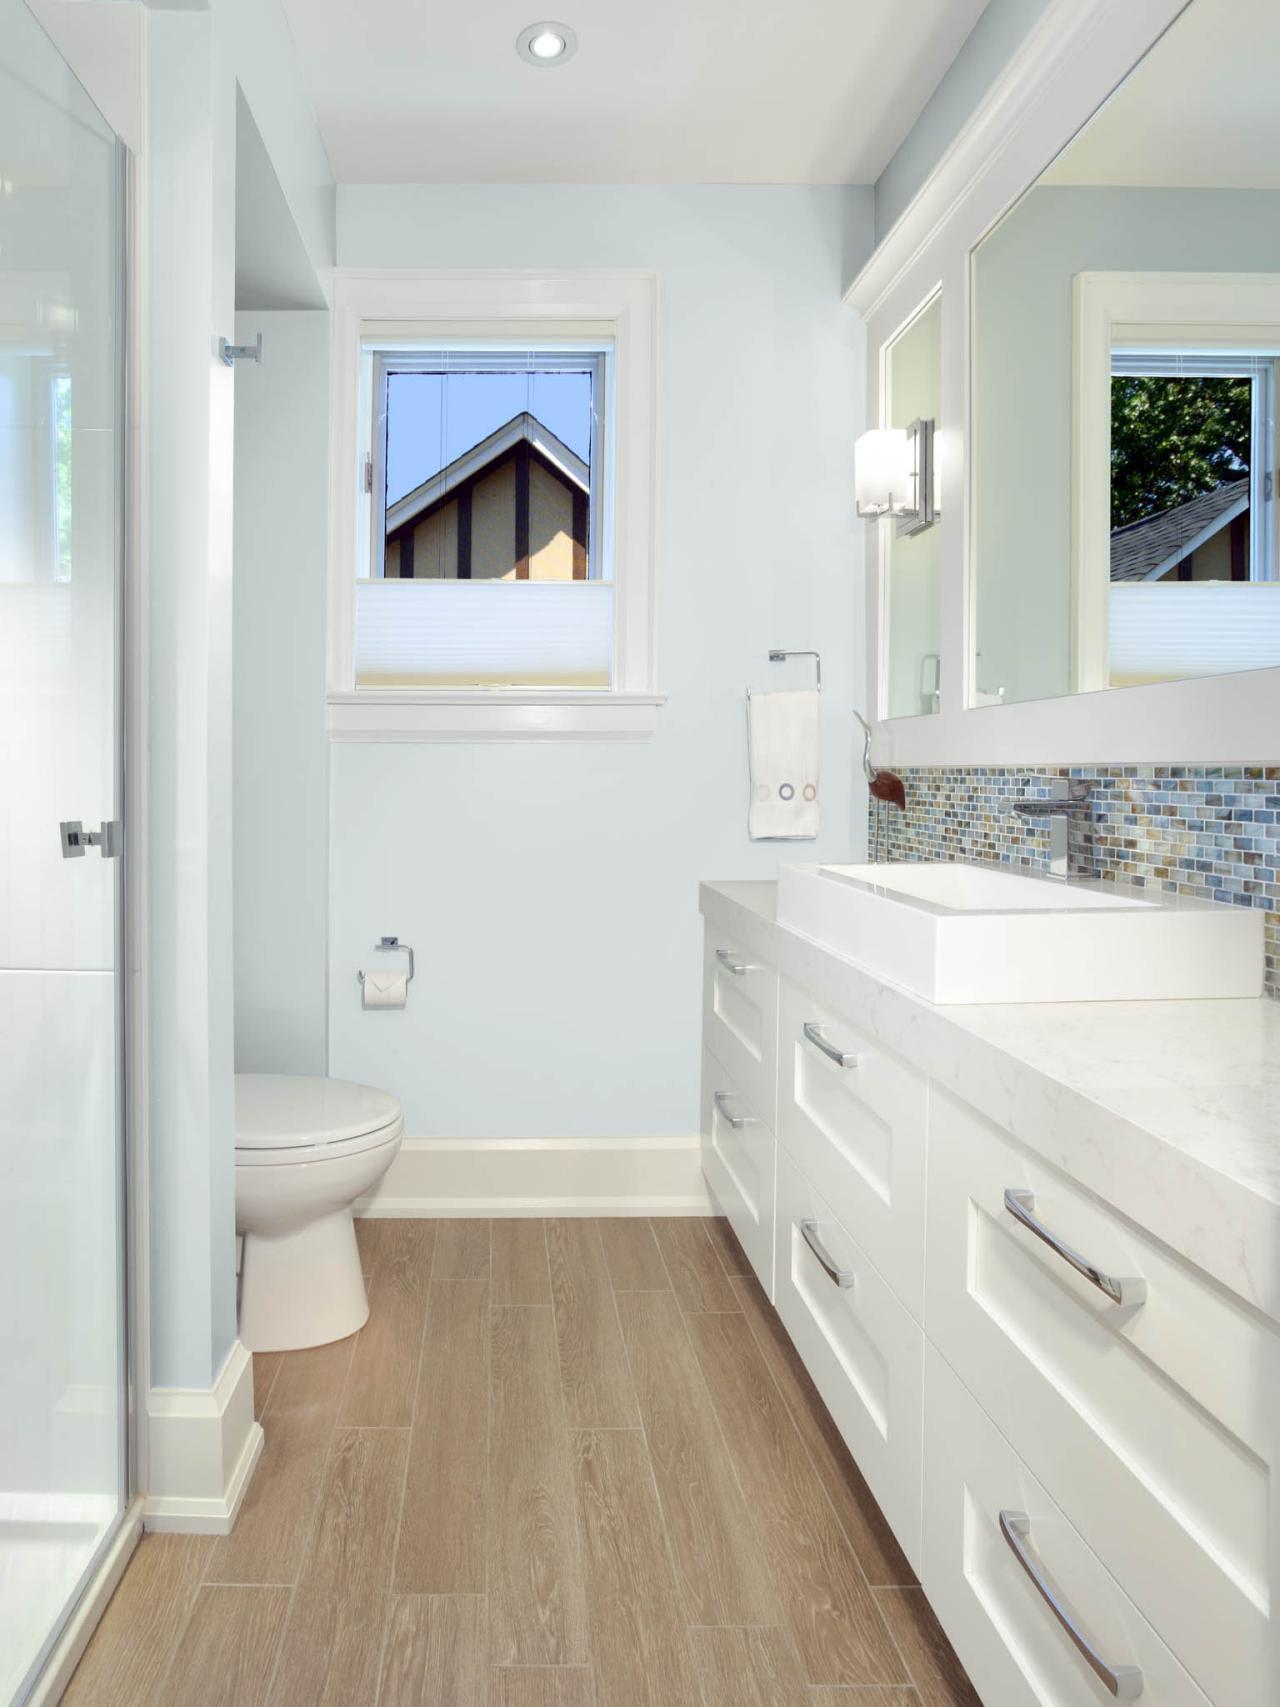 Tuscan Bathroom Design Ideas: HGTV Pictures & Tips   HGTV